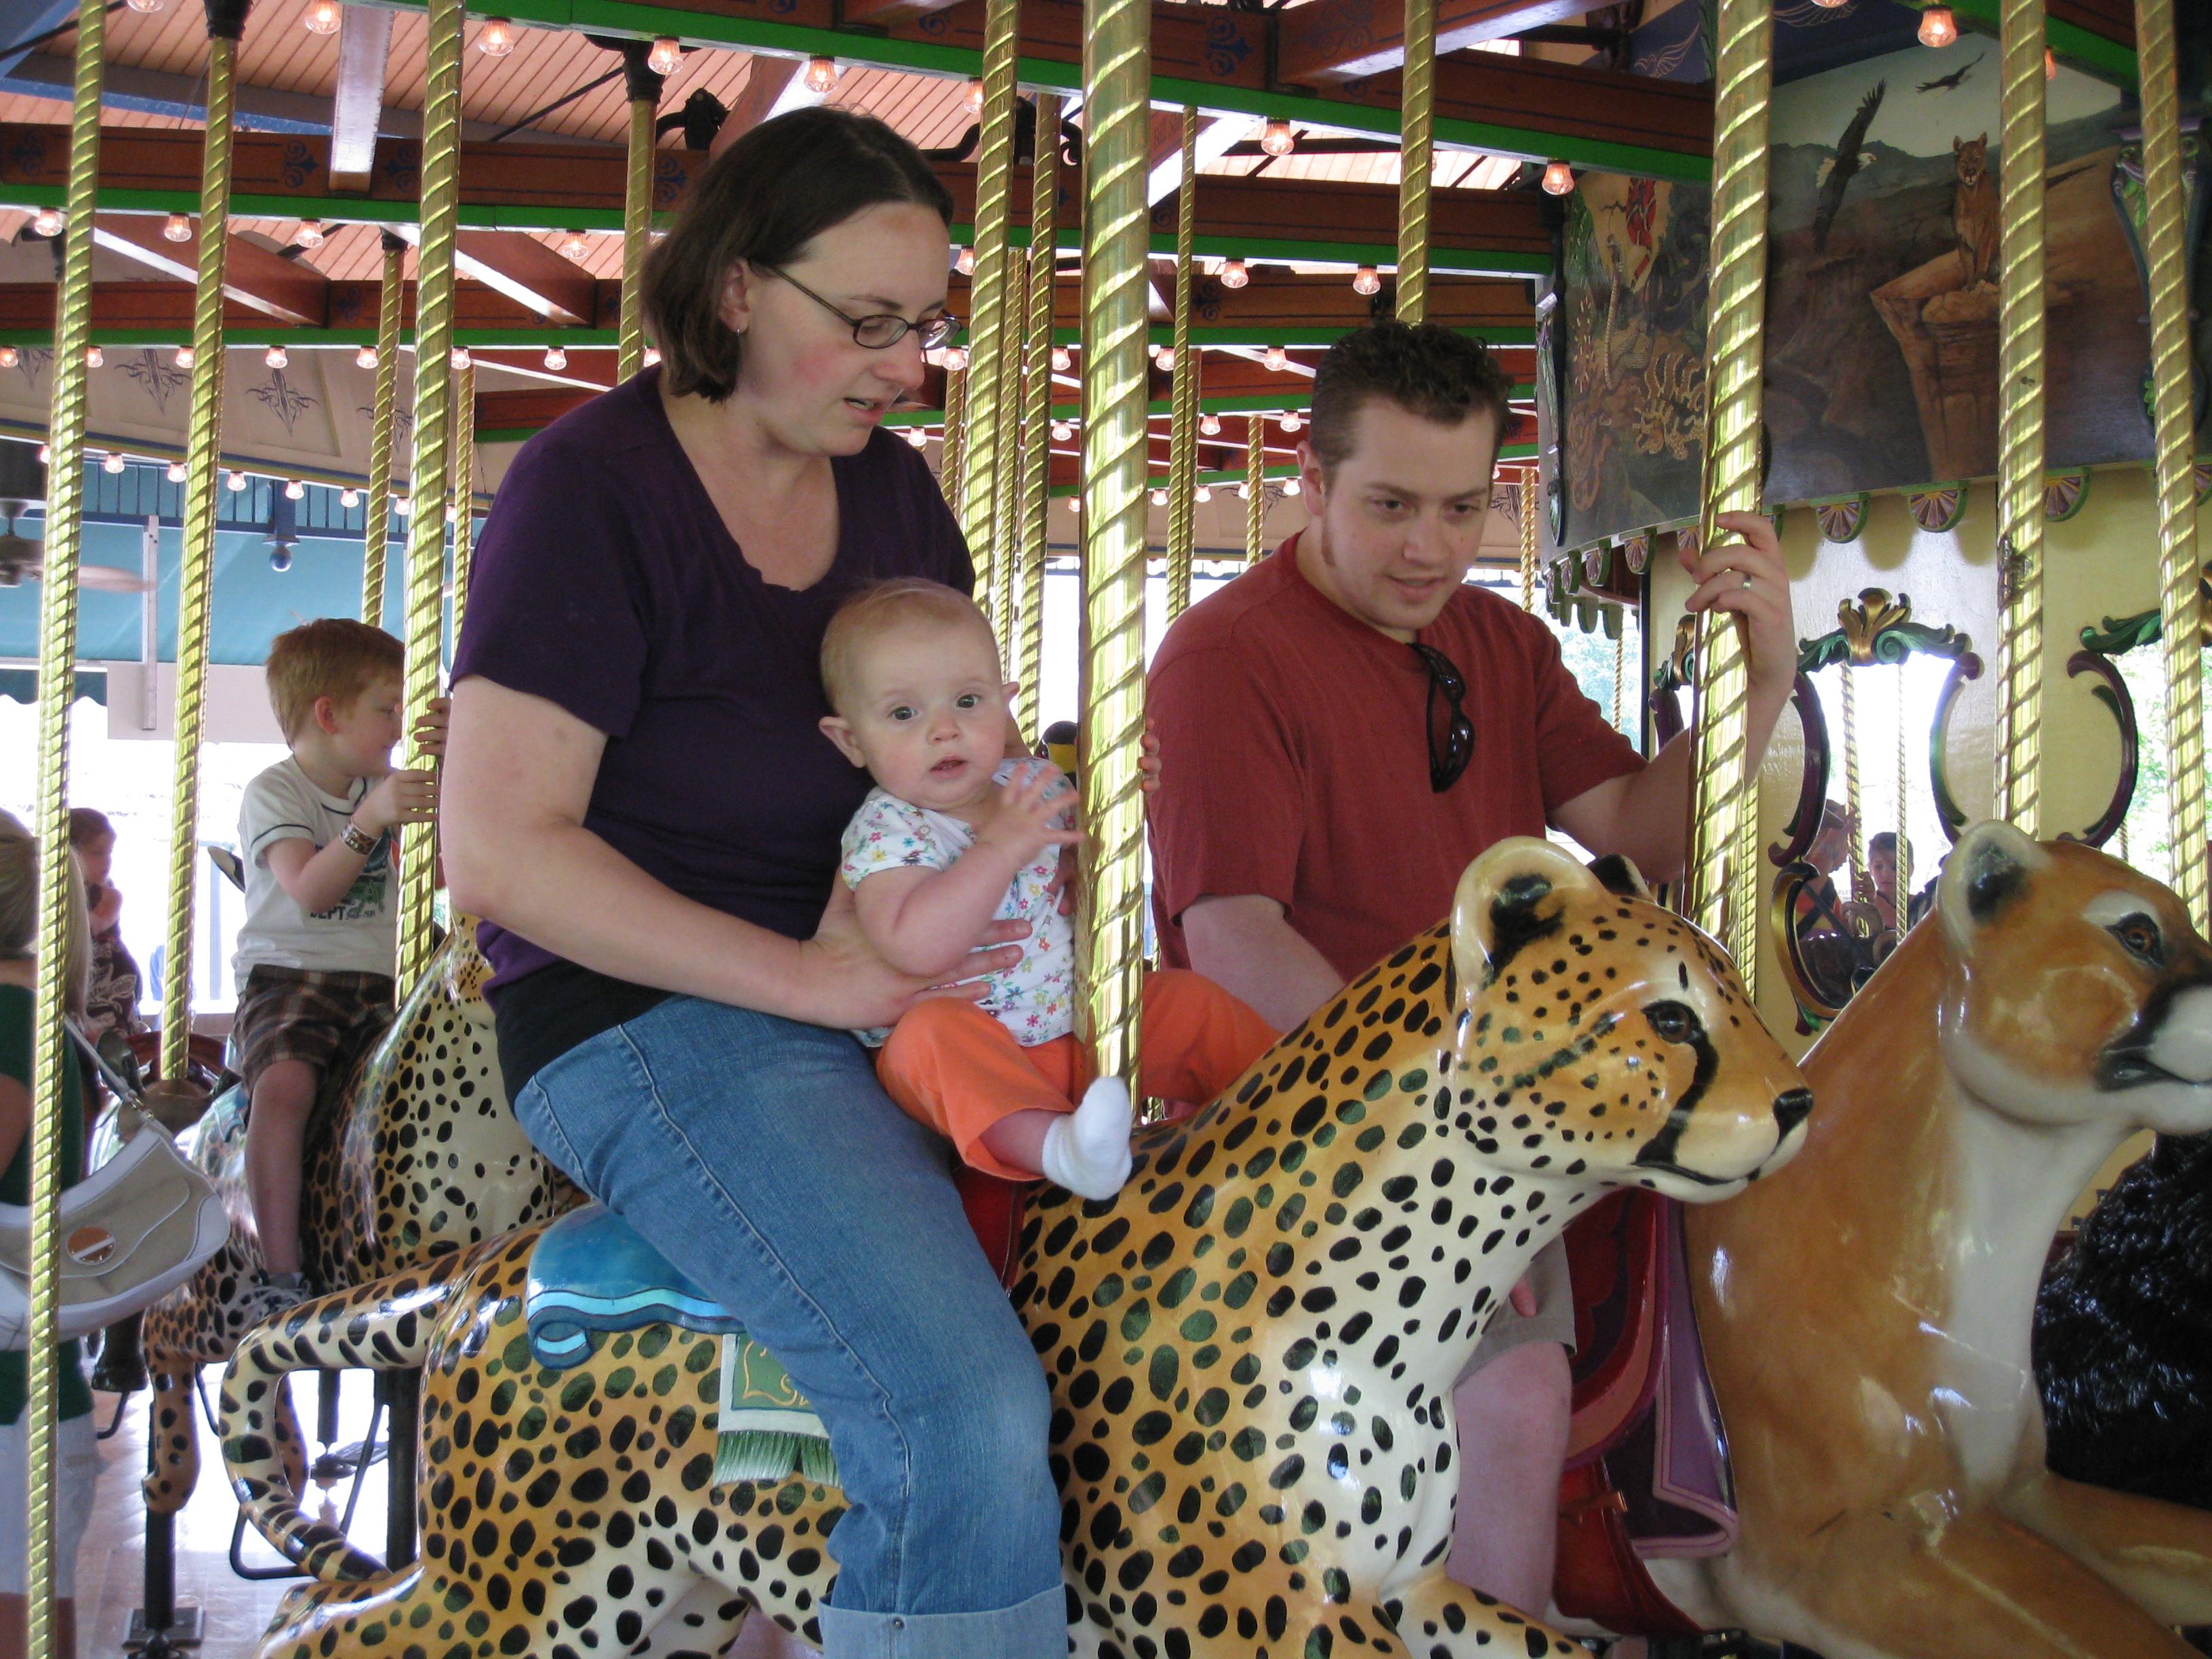 posing on the carousel